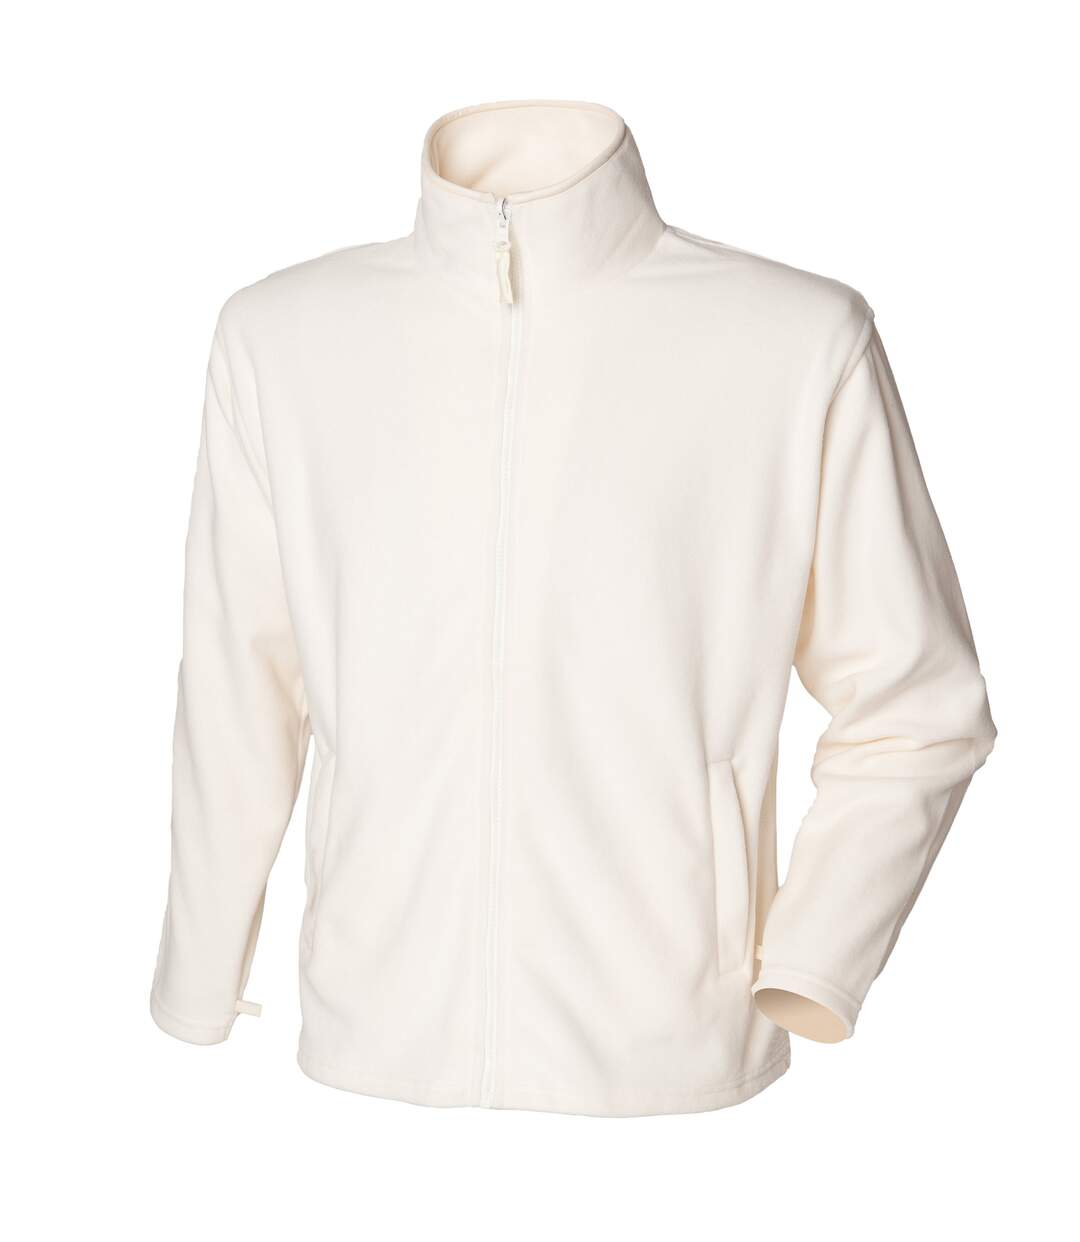 Henbury Mens Microfleece Anti-Pill Jacket (Charcoal Marl (Marl effect)) - UTRW678